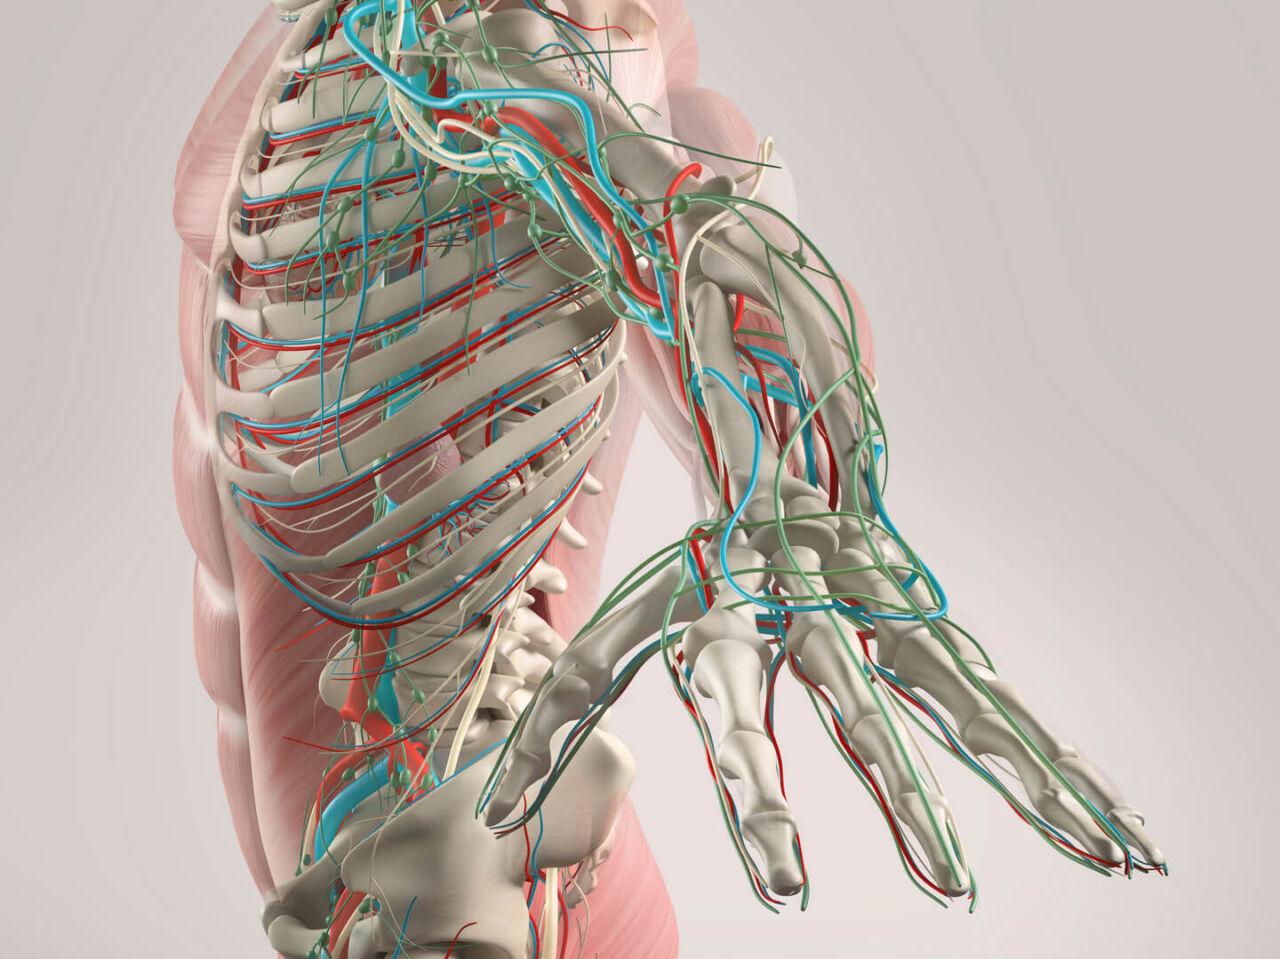 Ar circulatory system